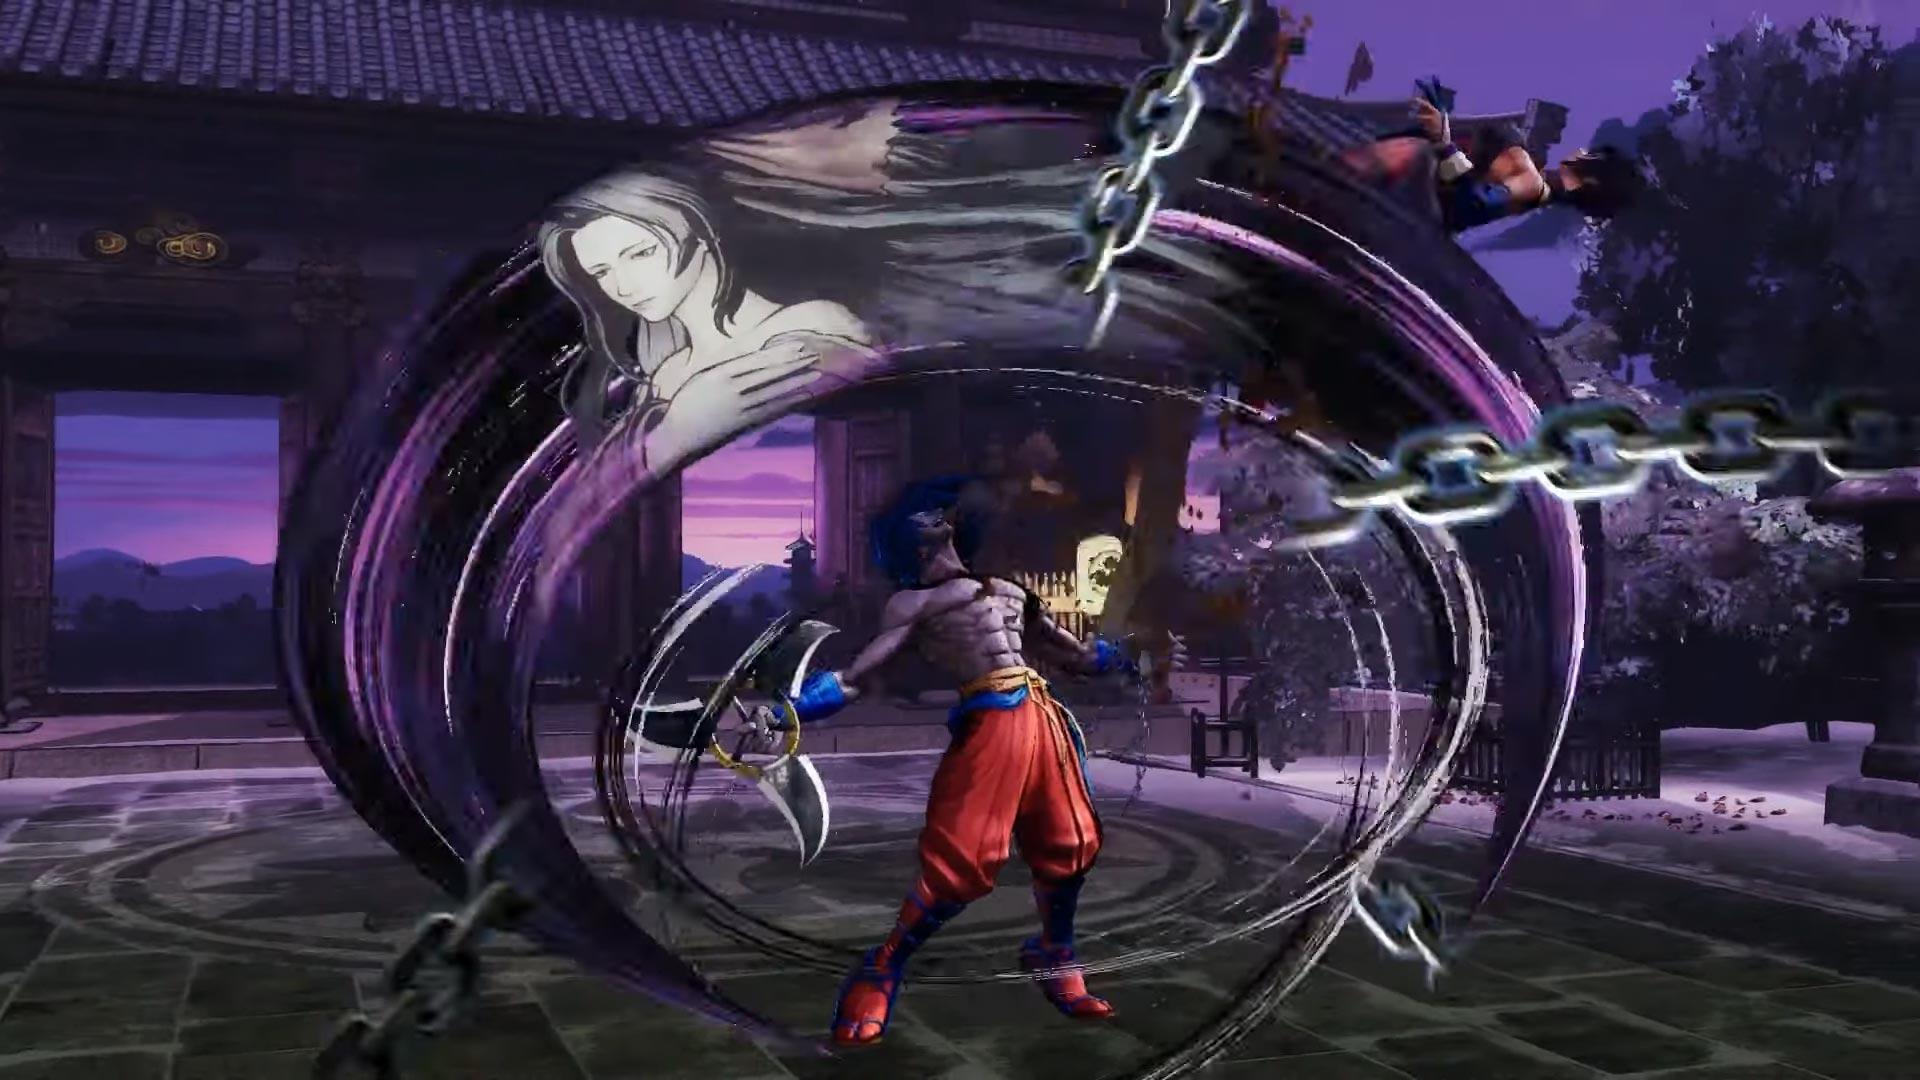 Samurai Shodown Basara Trailer Screenshots 8 out of 9 image gallery